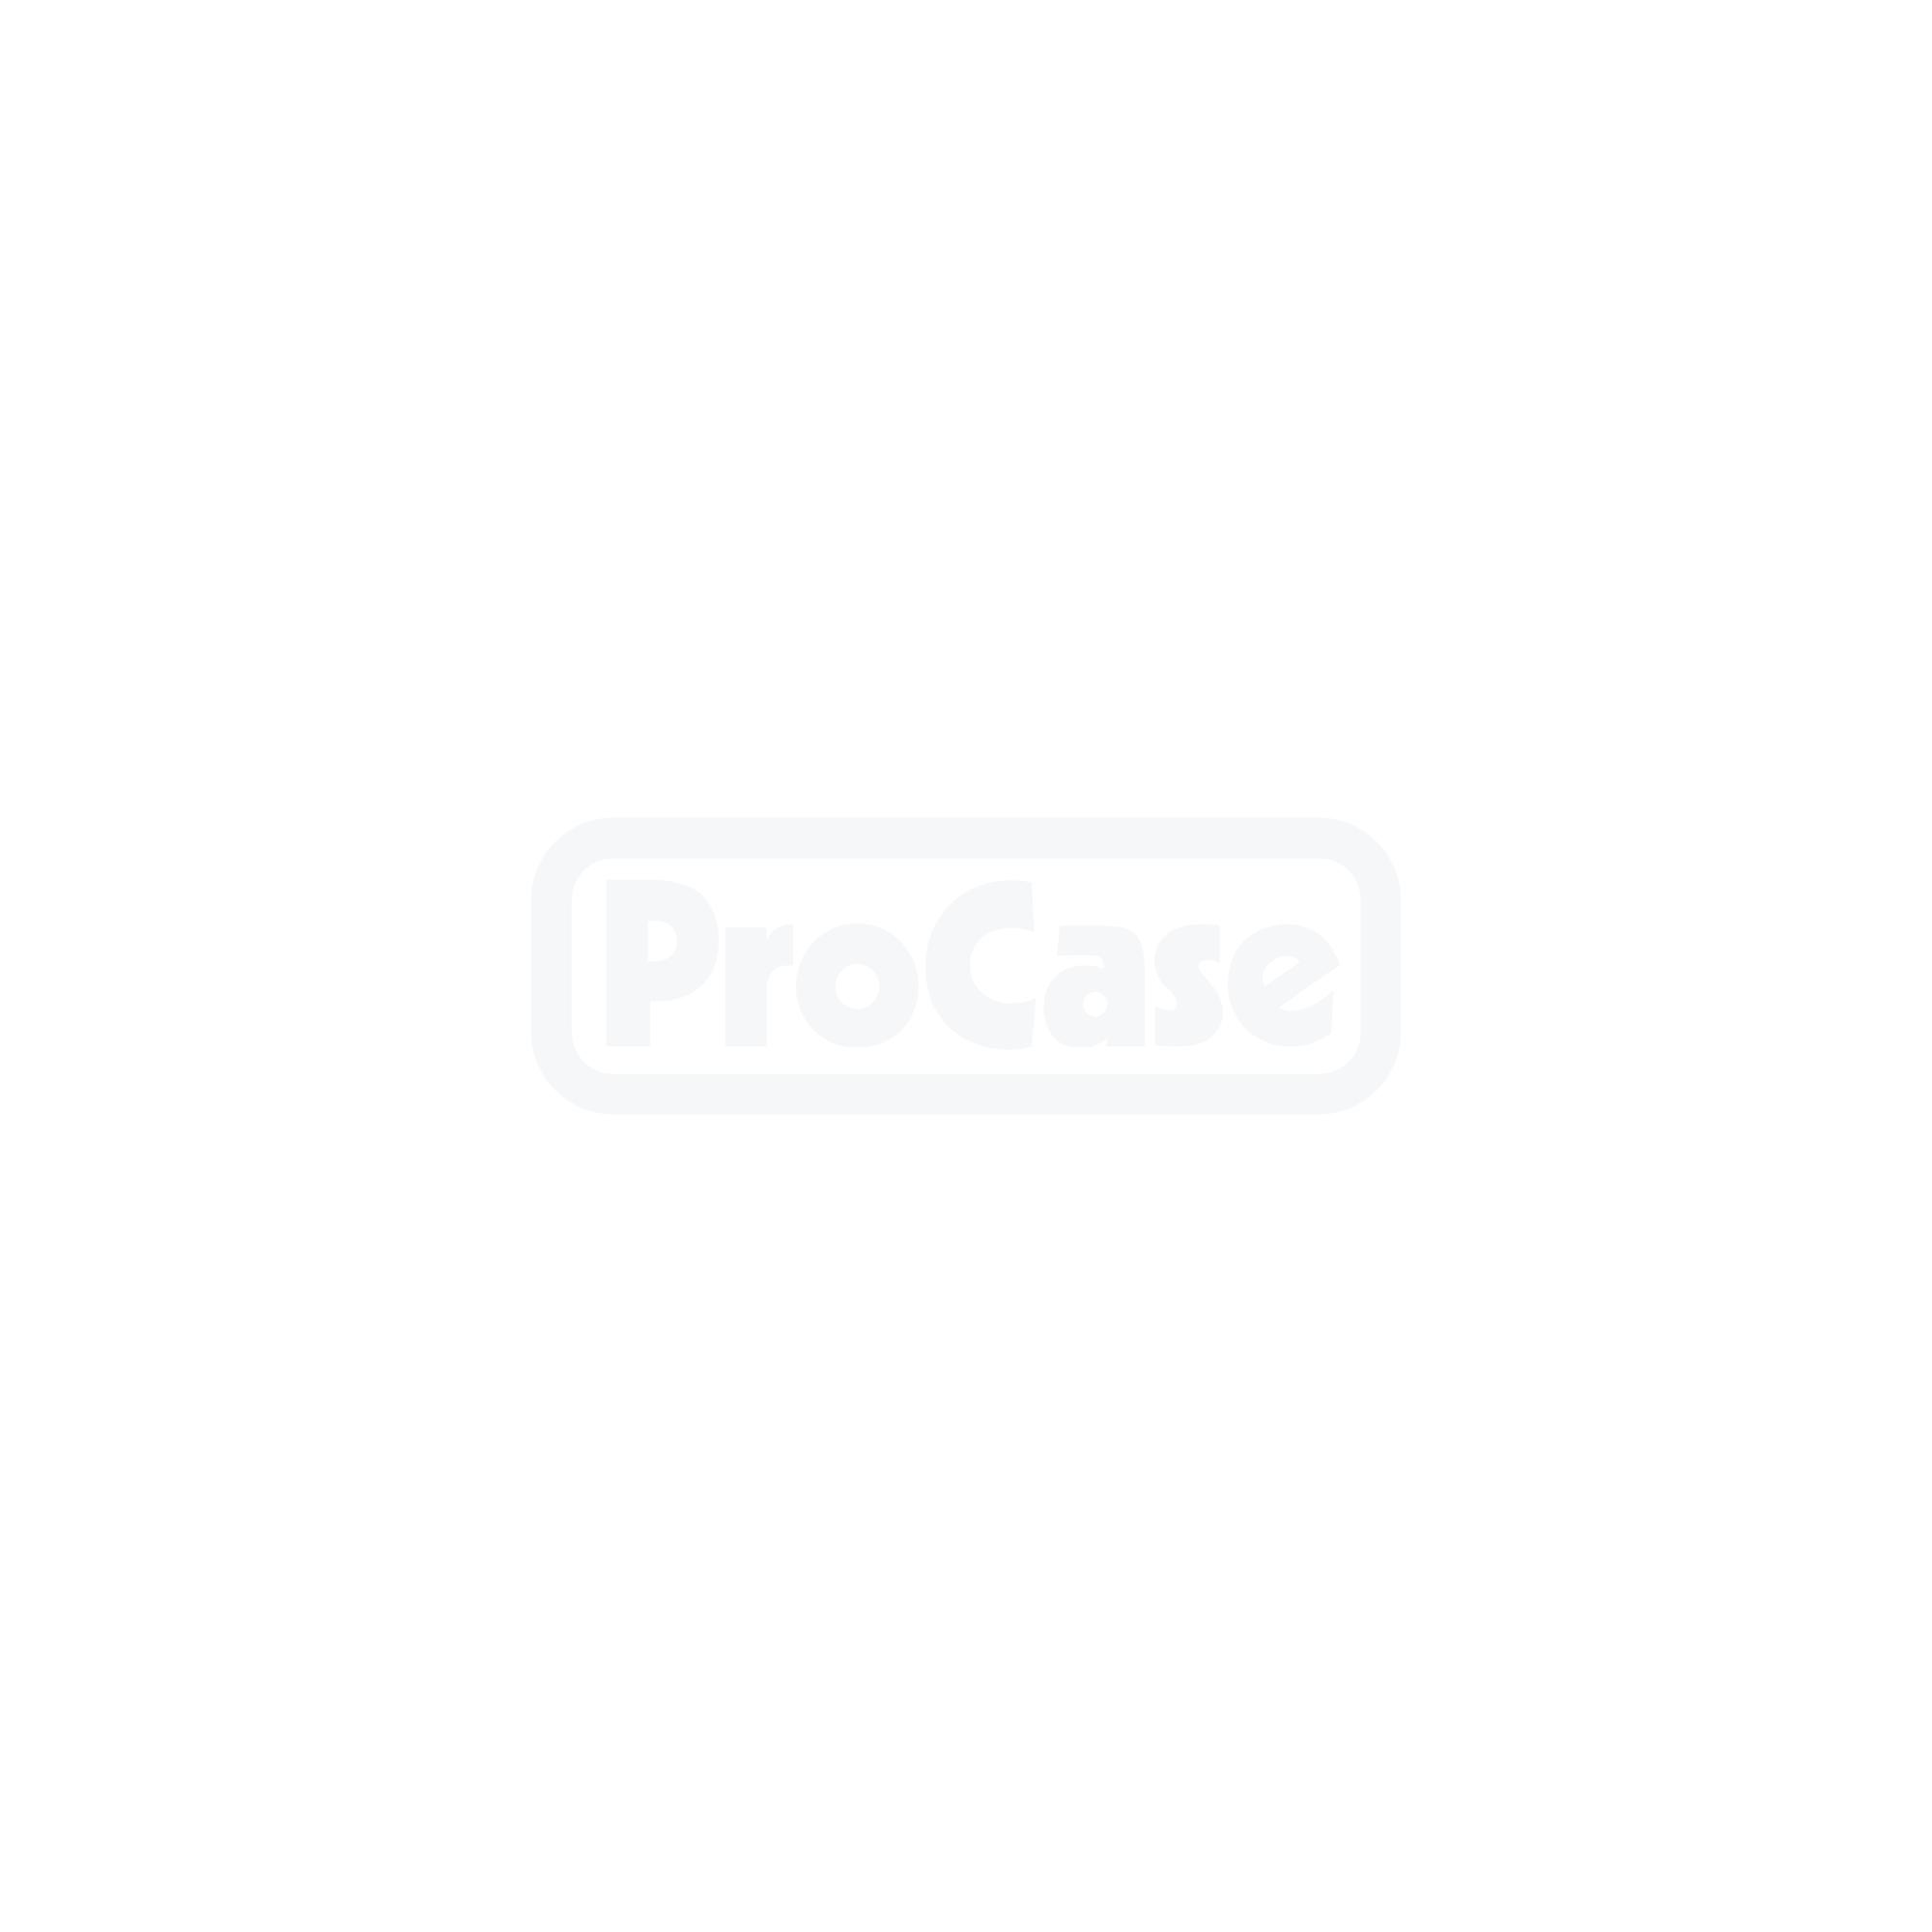 Rampencase für Alpha Omega MicroGuide Pro 2